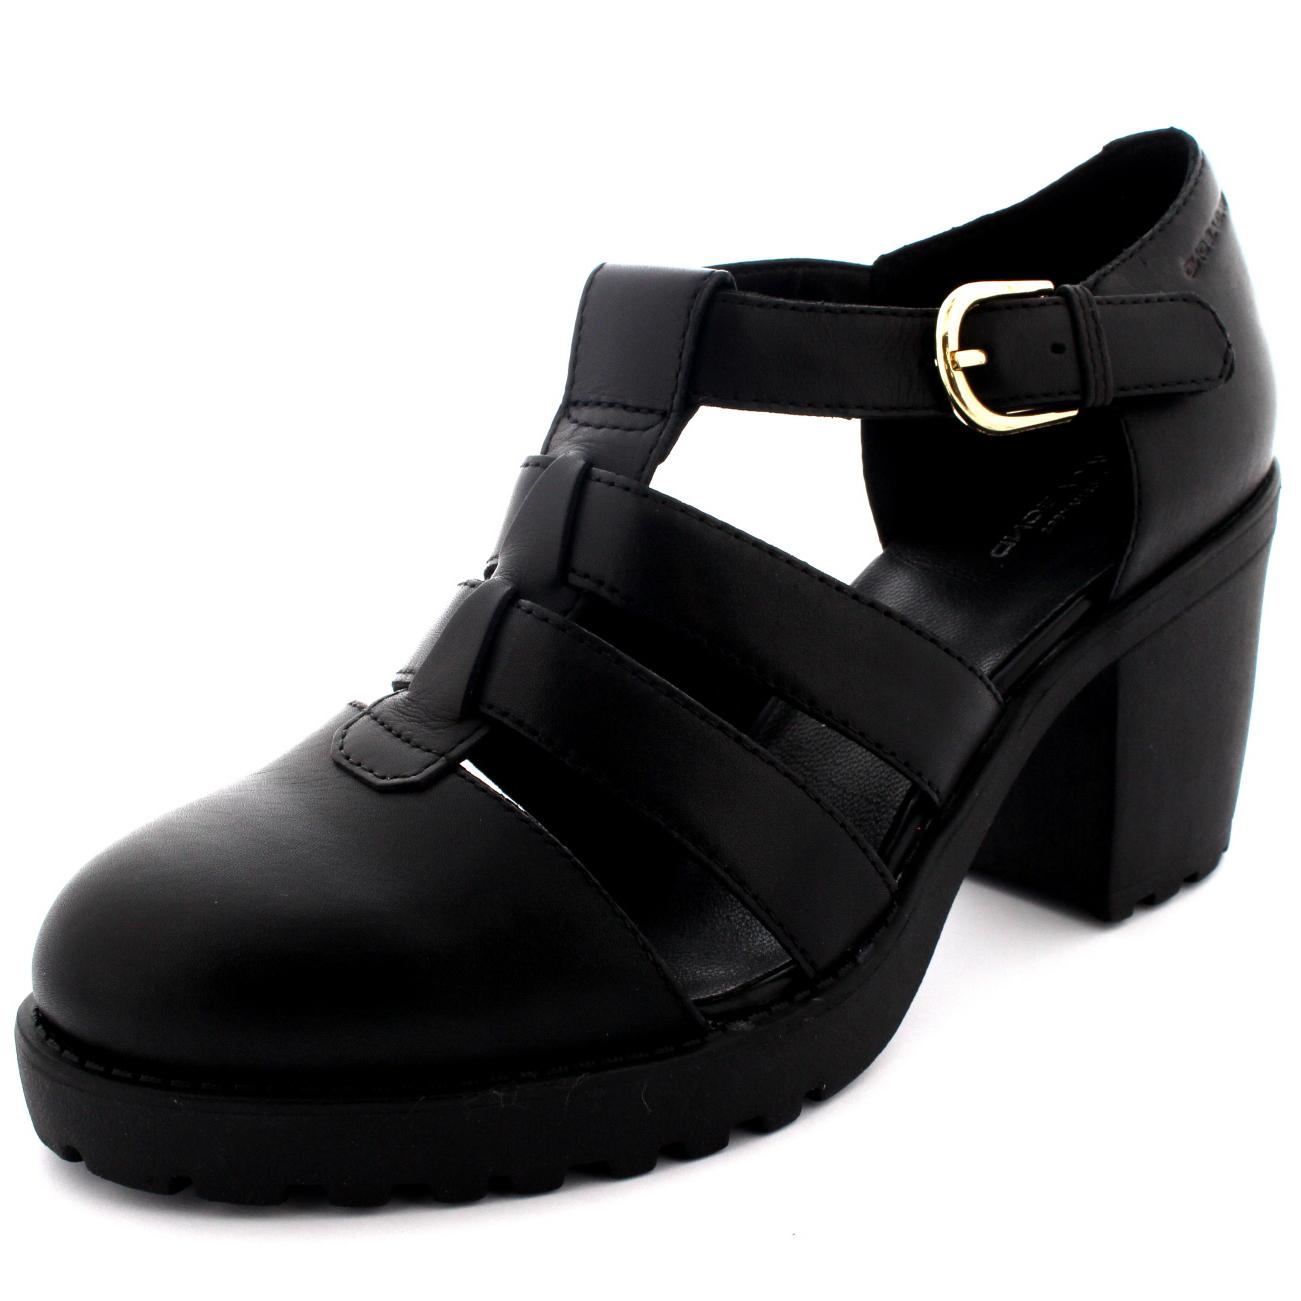 Ladies Vagabond Grace Summer Ankle Boot Gladiator Block